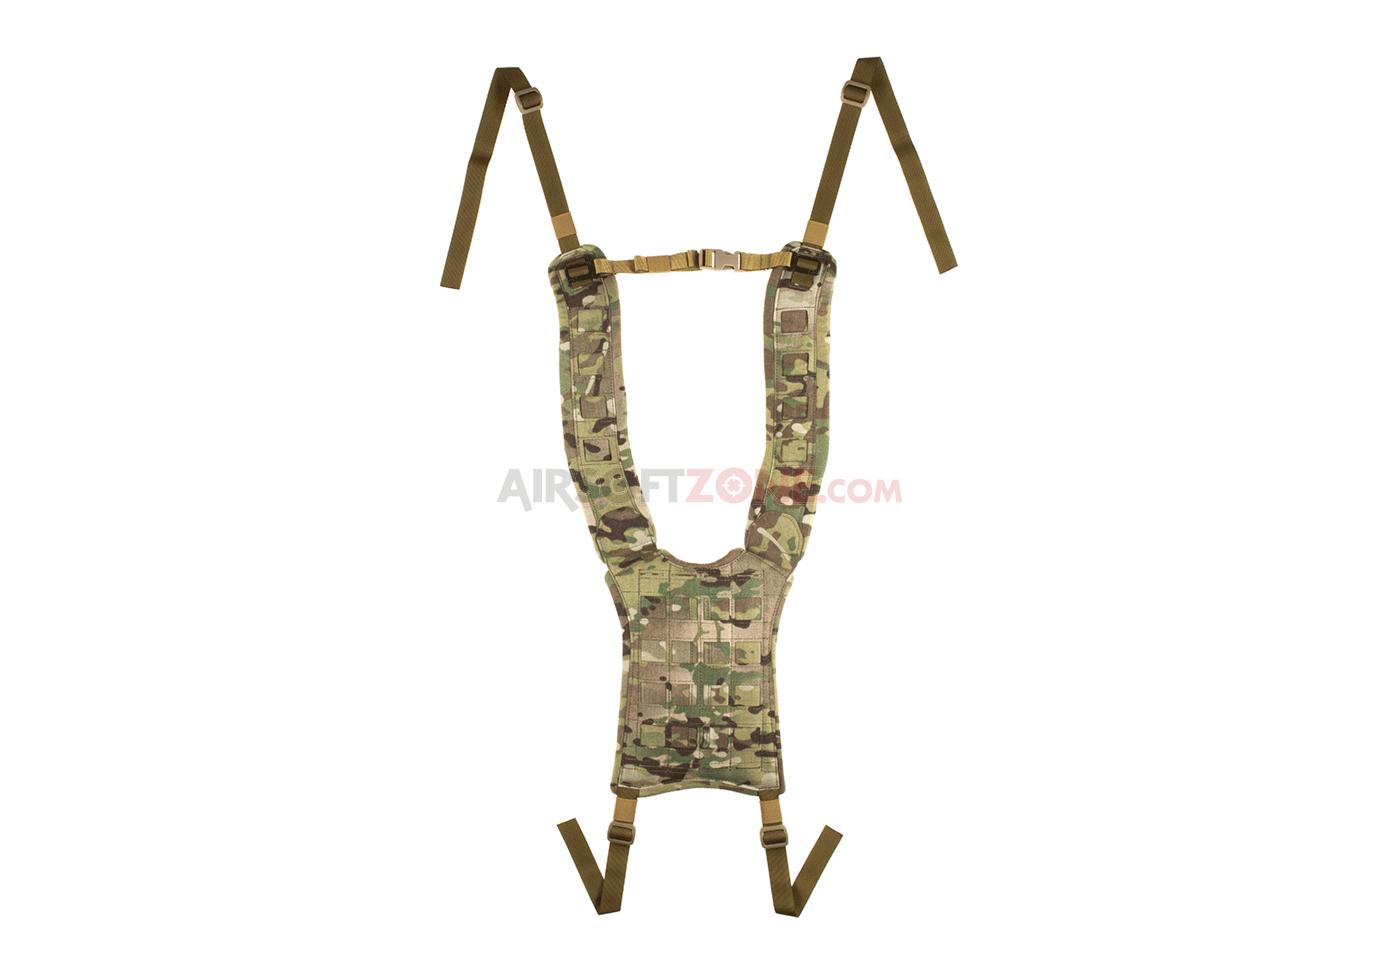 f55d1abec 4-Point H-Harness Multicam (Templar s Gear) - Suspenders - Load ...